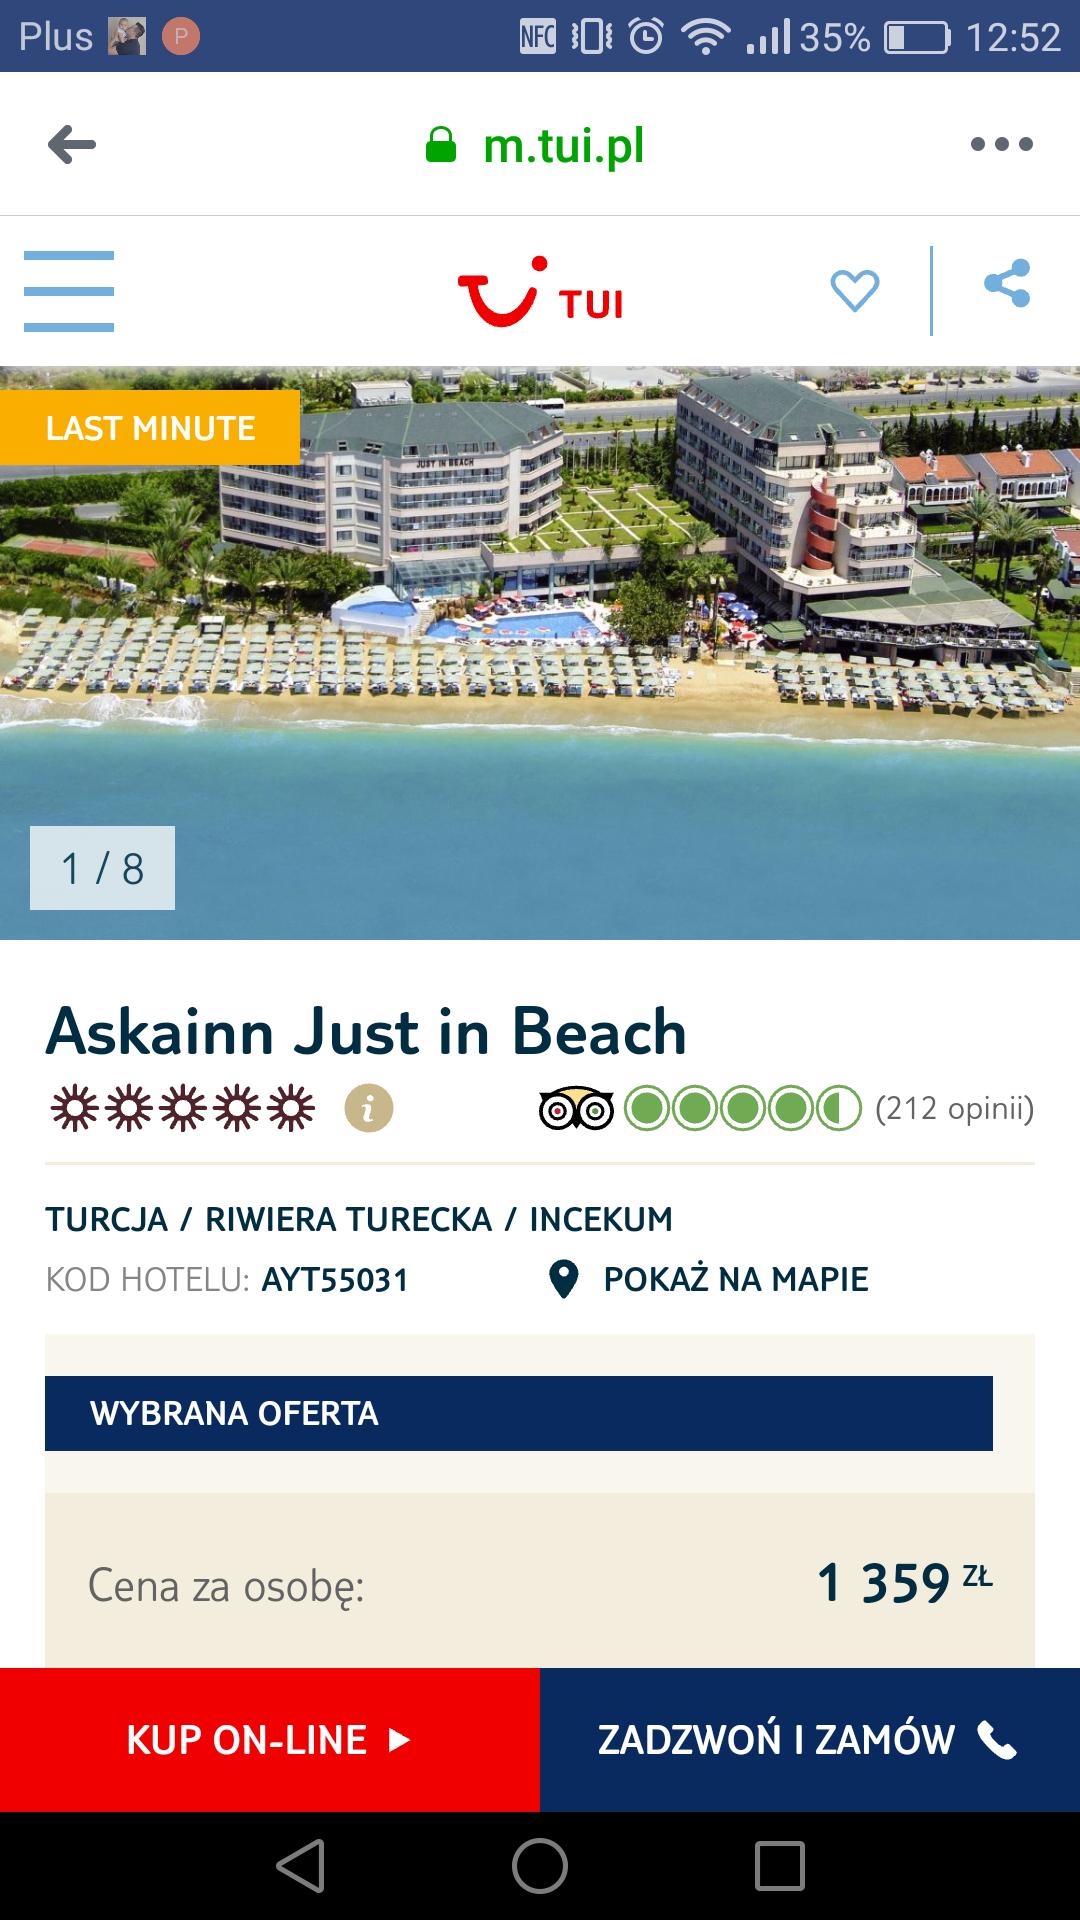 14 dni all inclusive w 5* hotelu w Turcji od Tui